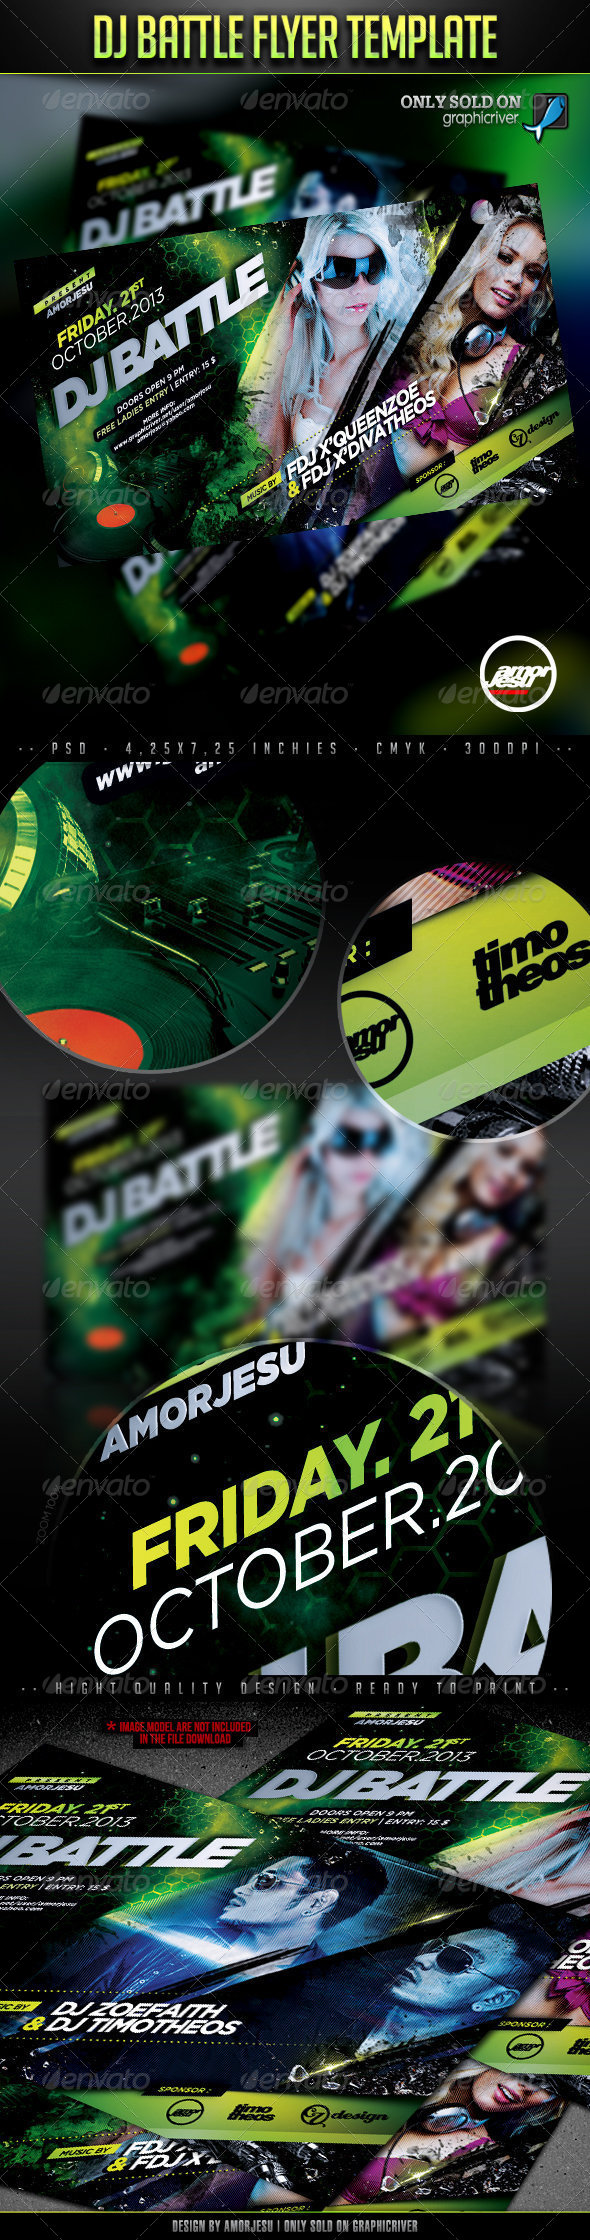 DJ Battle Flyer Template - Clubs & Parties Events